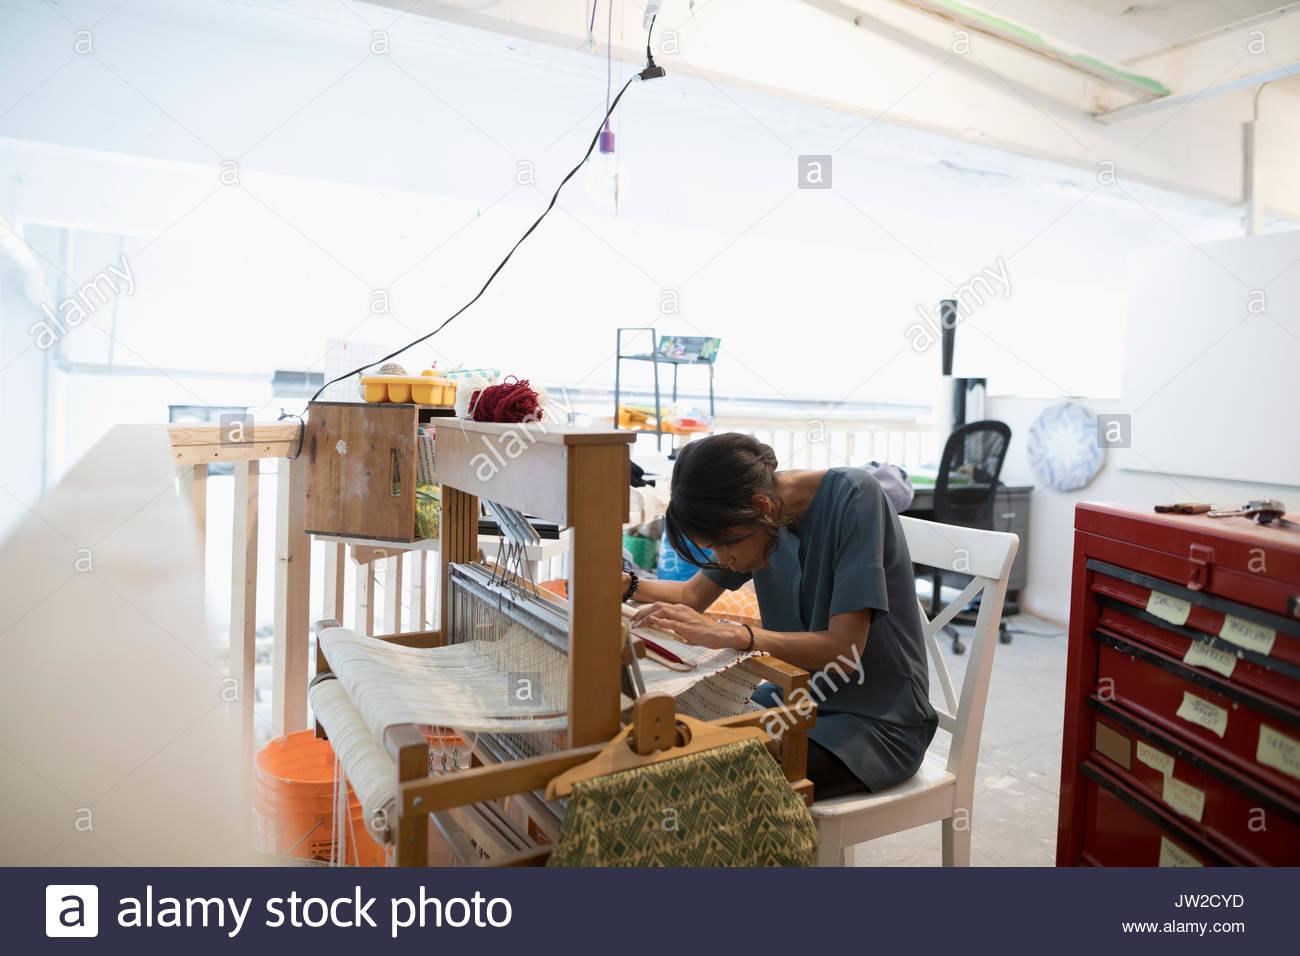 Female weaver weaving at loom in art studio Stock Photo